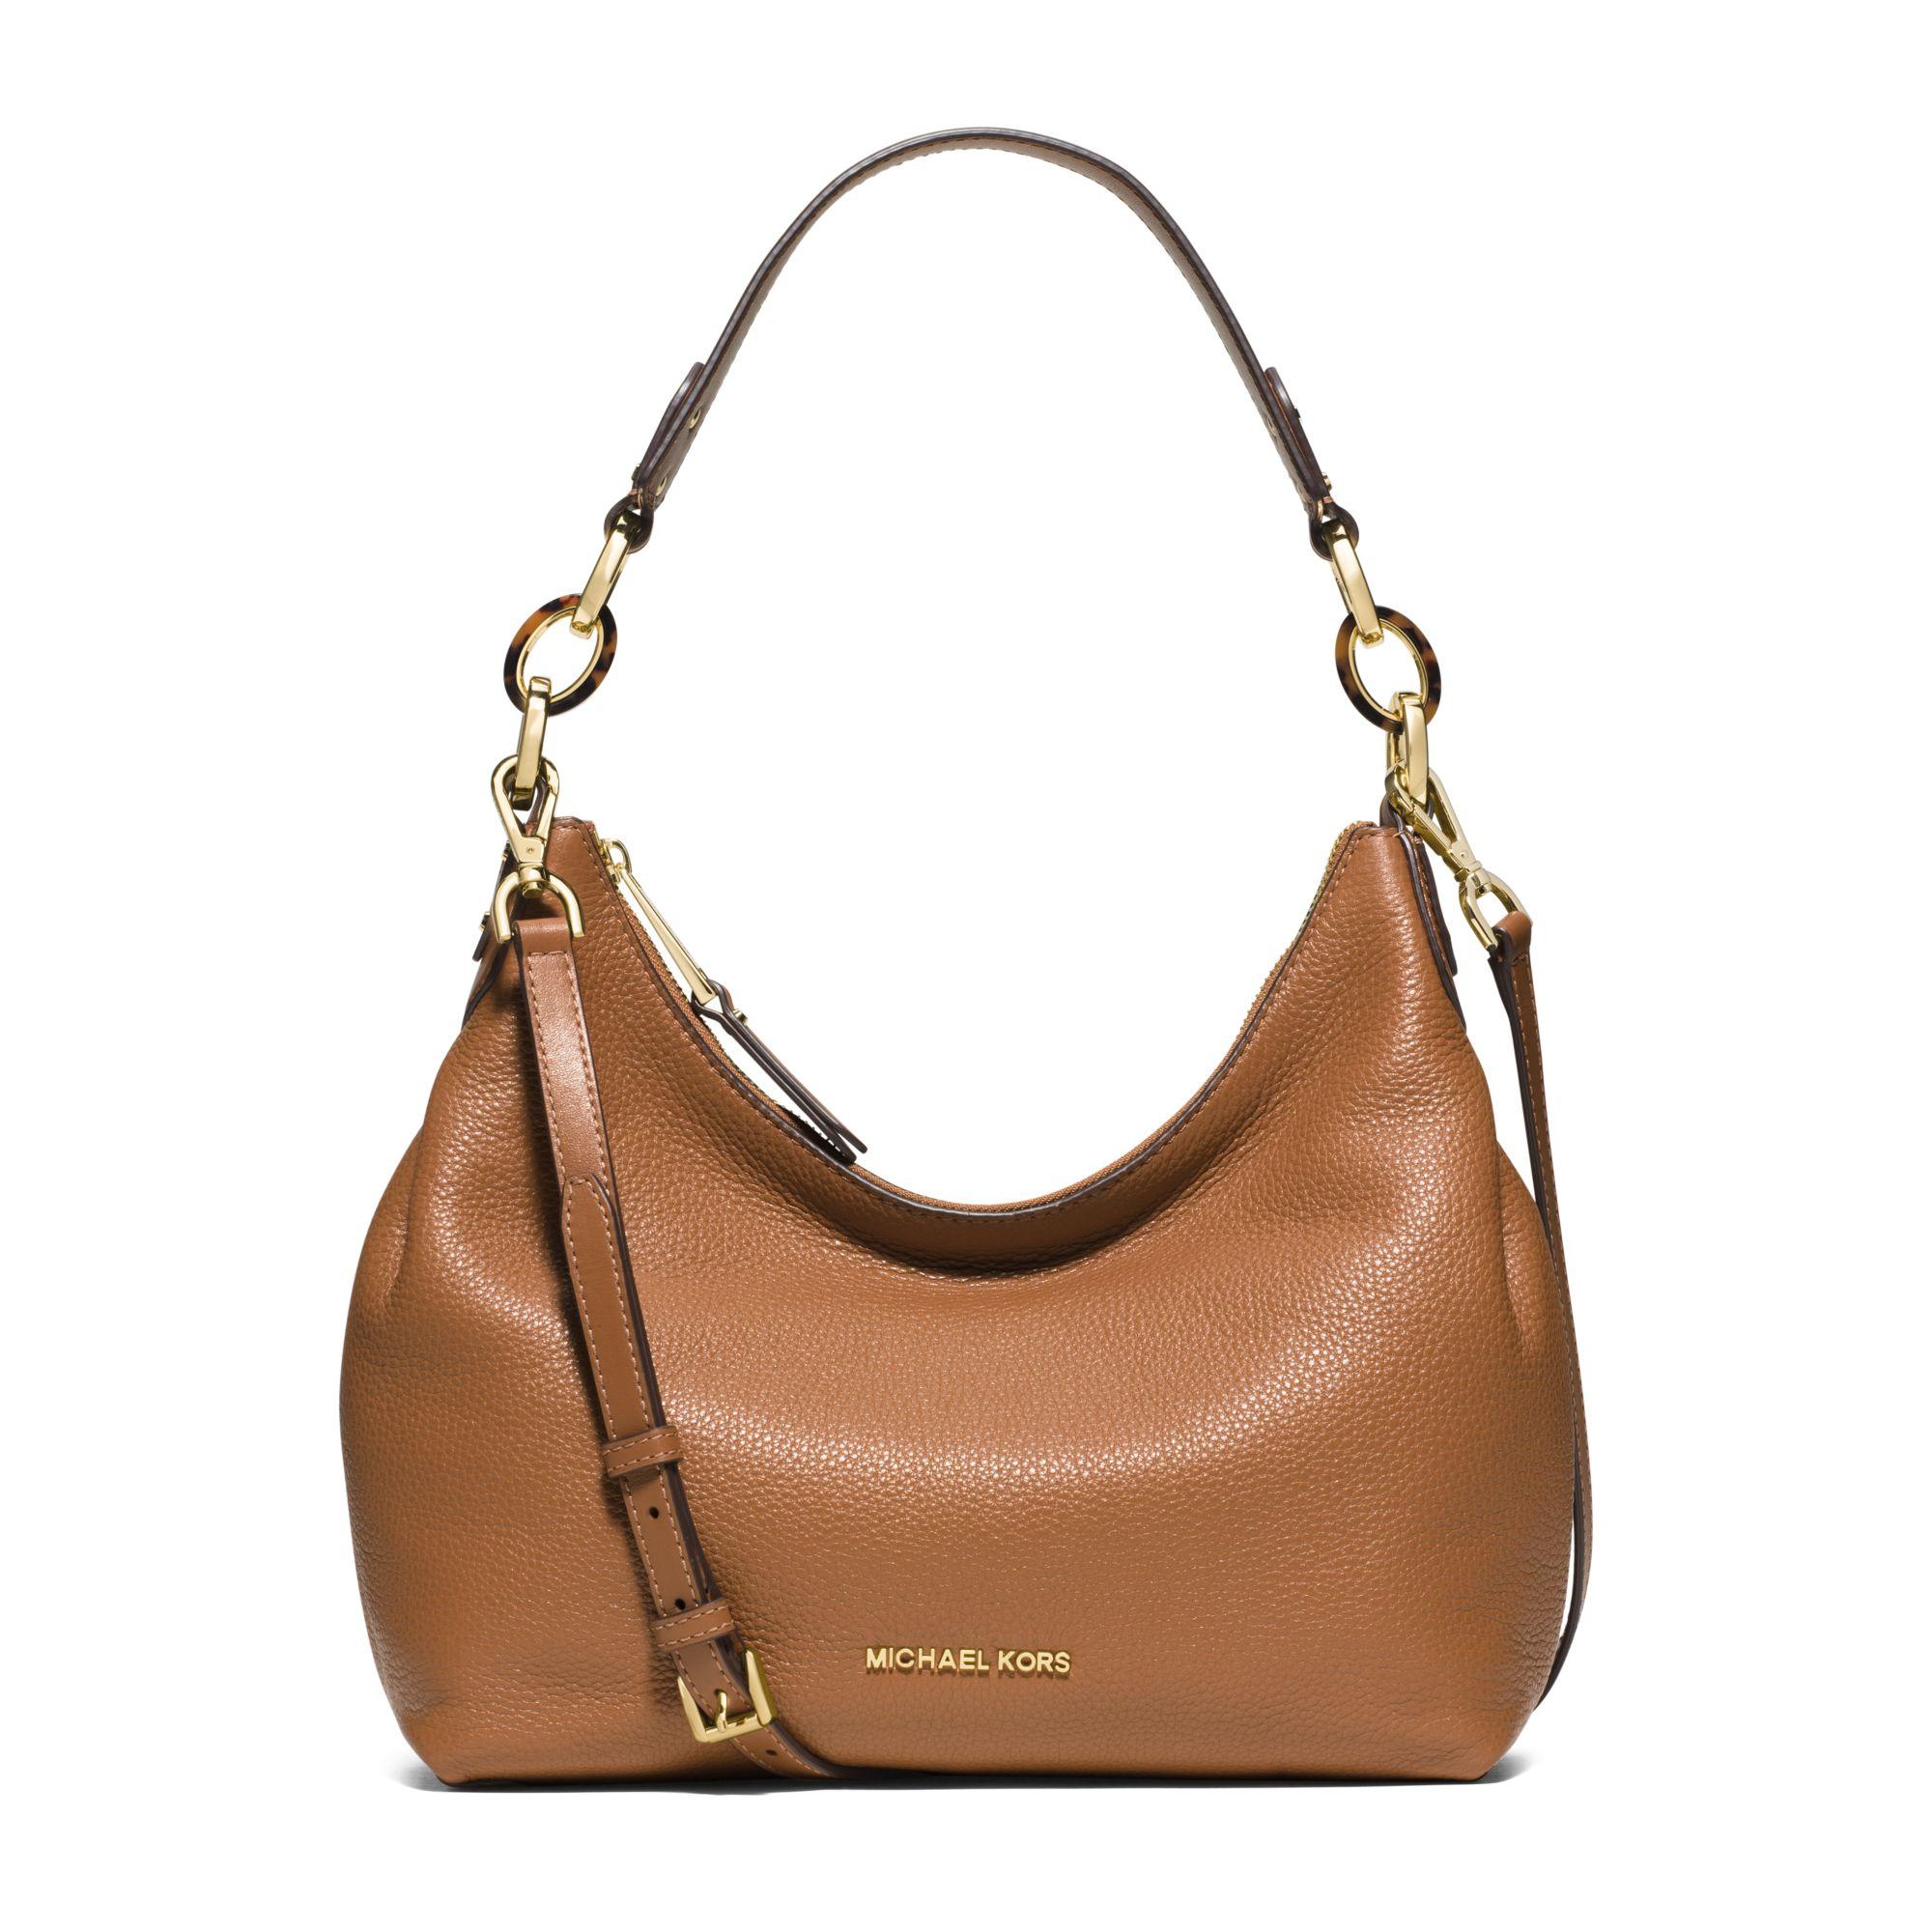 77939d968bef Lyst - Michael Kors Isabella Medium Leather Shoulder Bag in Brown